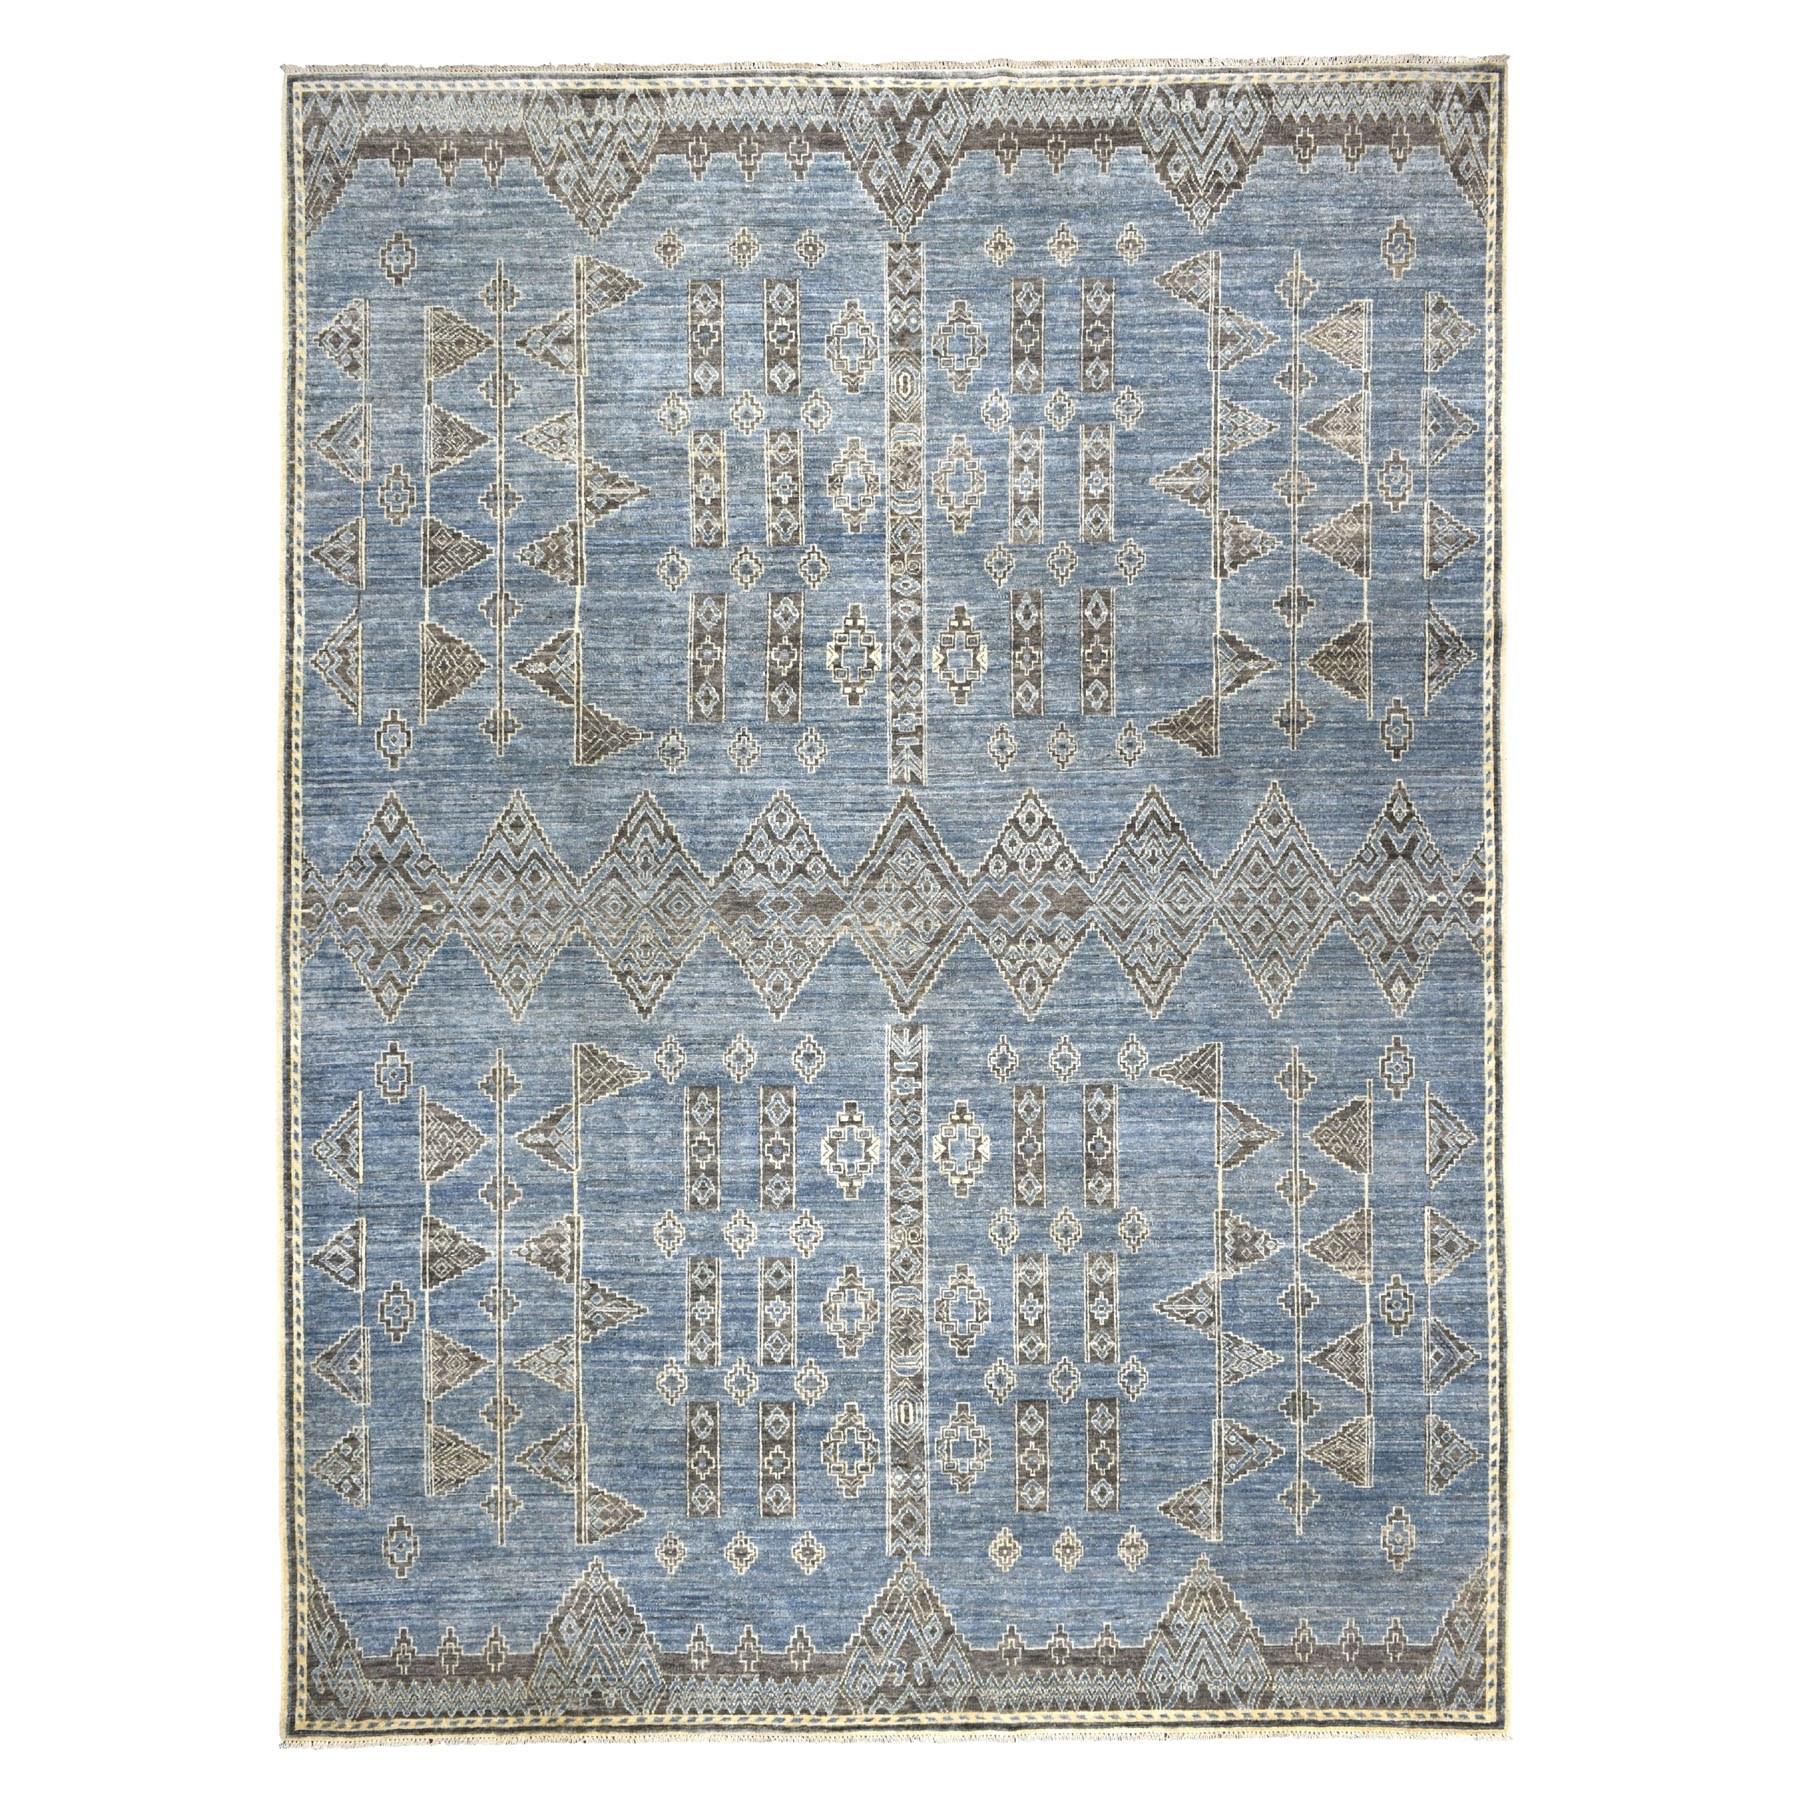 9'X12' Blue Peshawar Berber Motif Influence Southwestern Design Pure Wool Oriental Rug moaebd8d